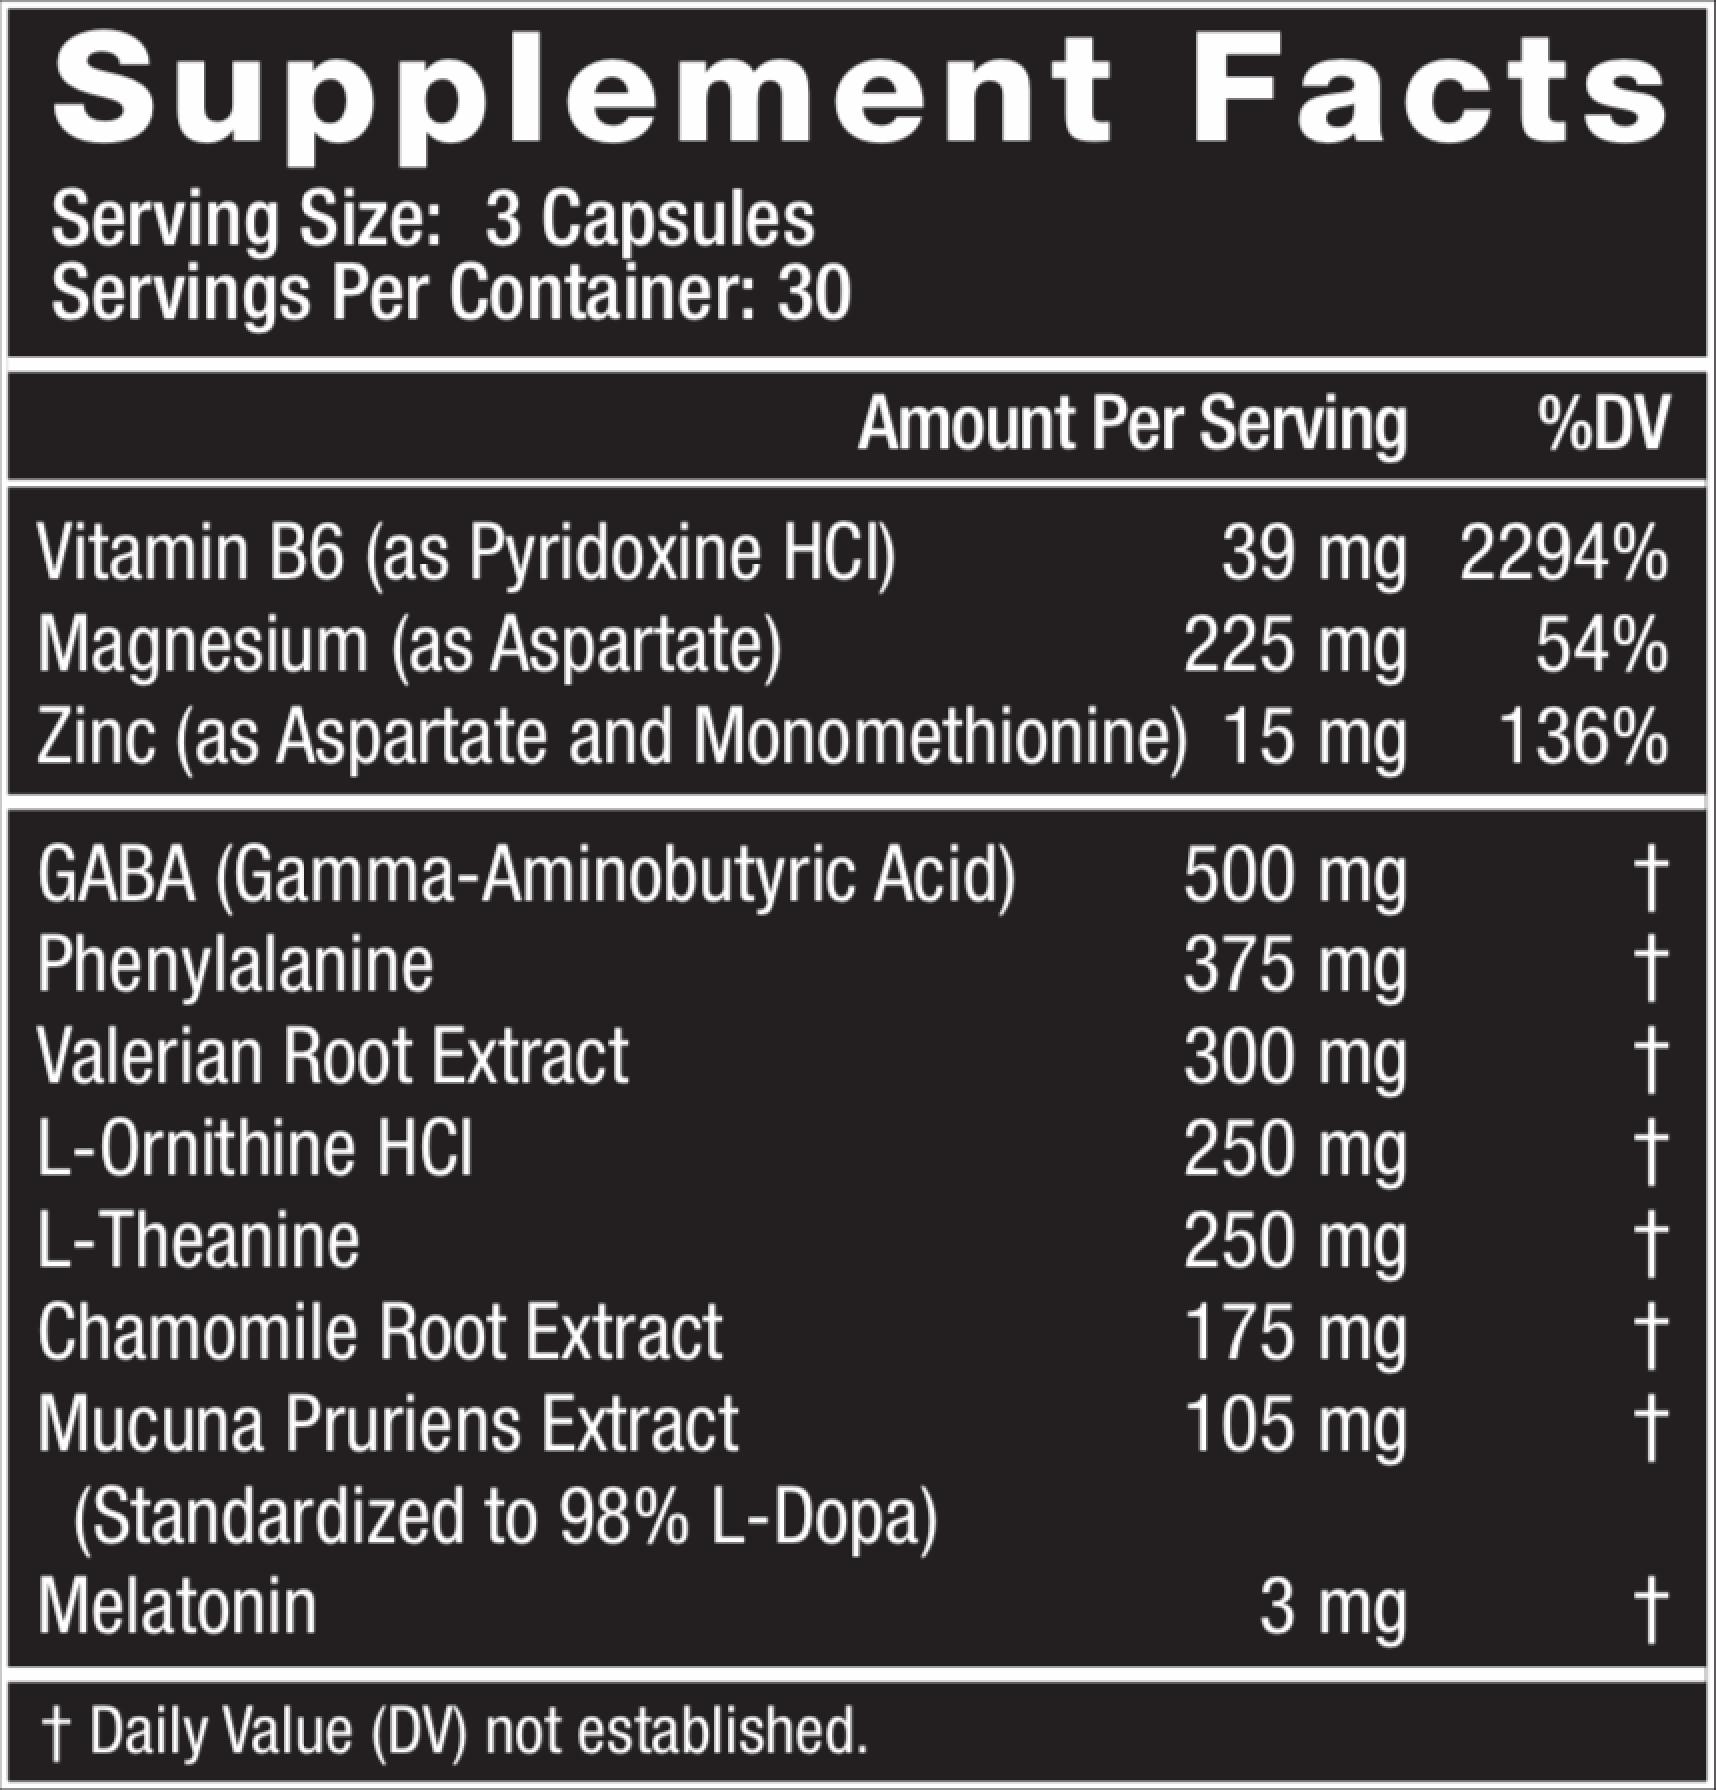 Gorilla Dream Ingredients - Supplement Facts Panel